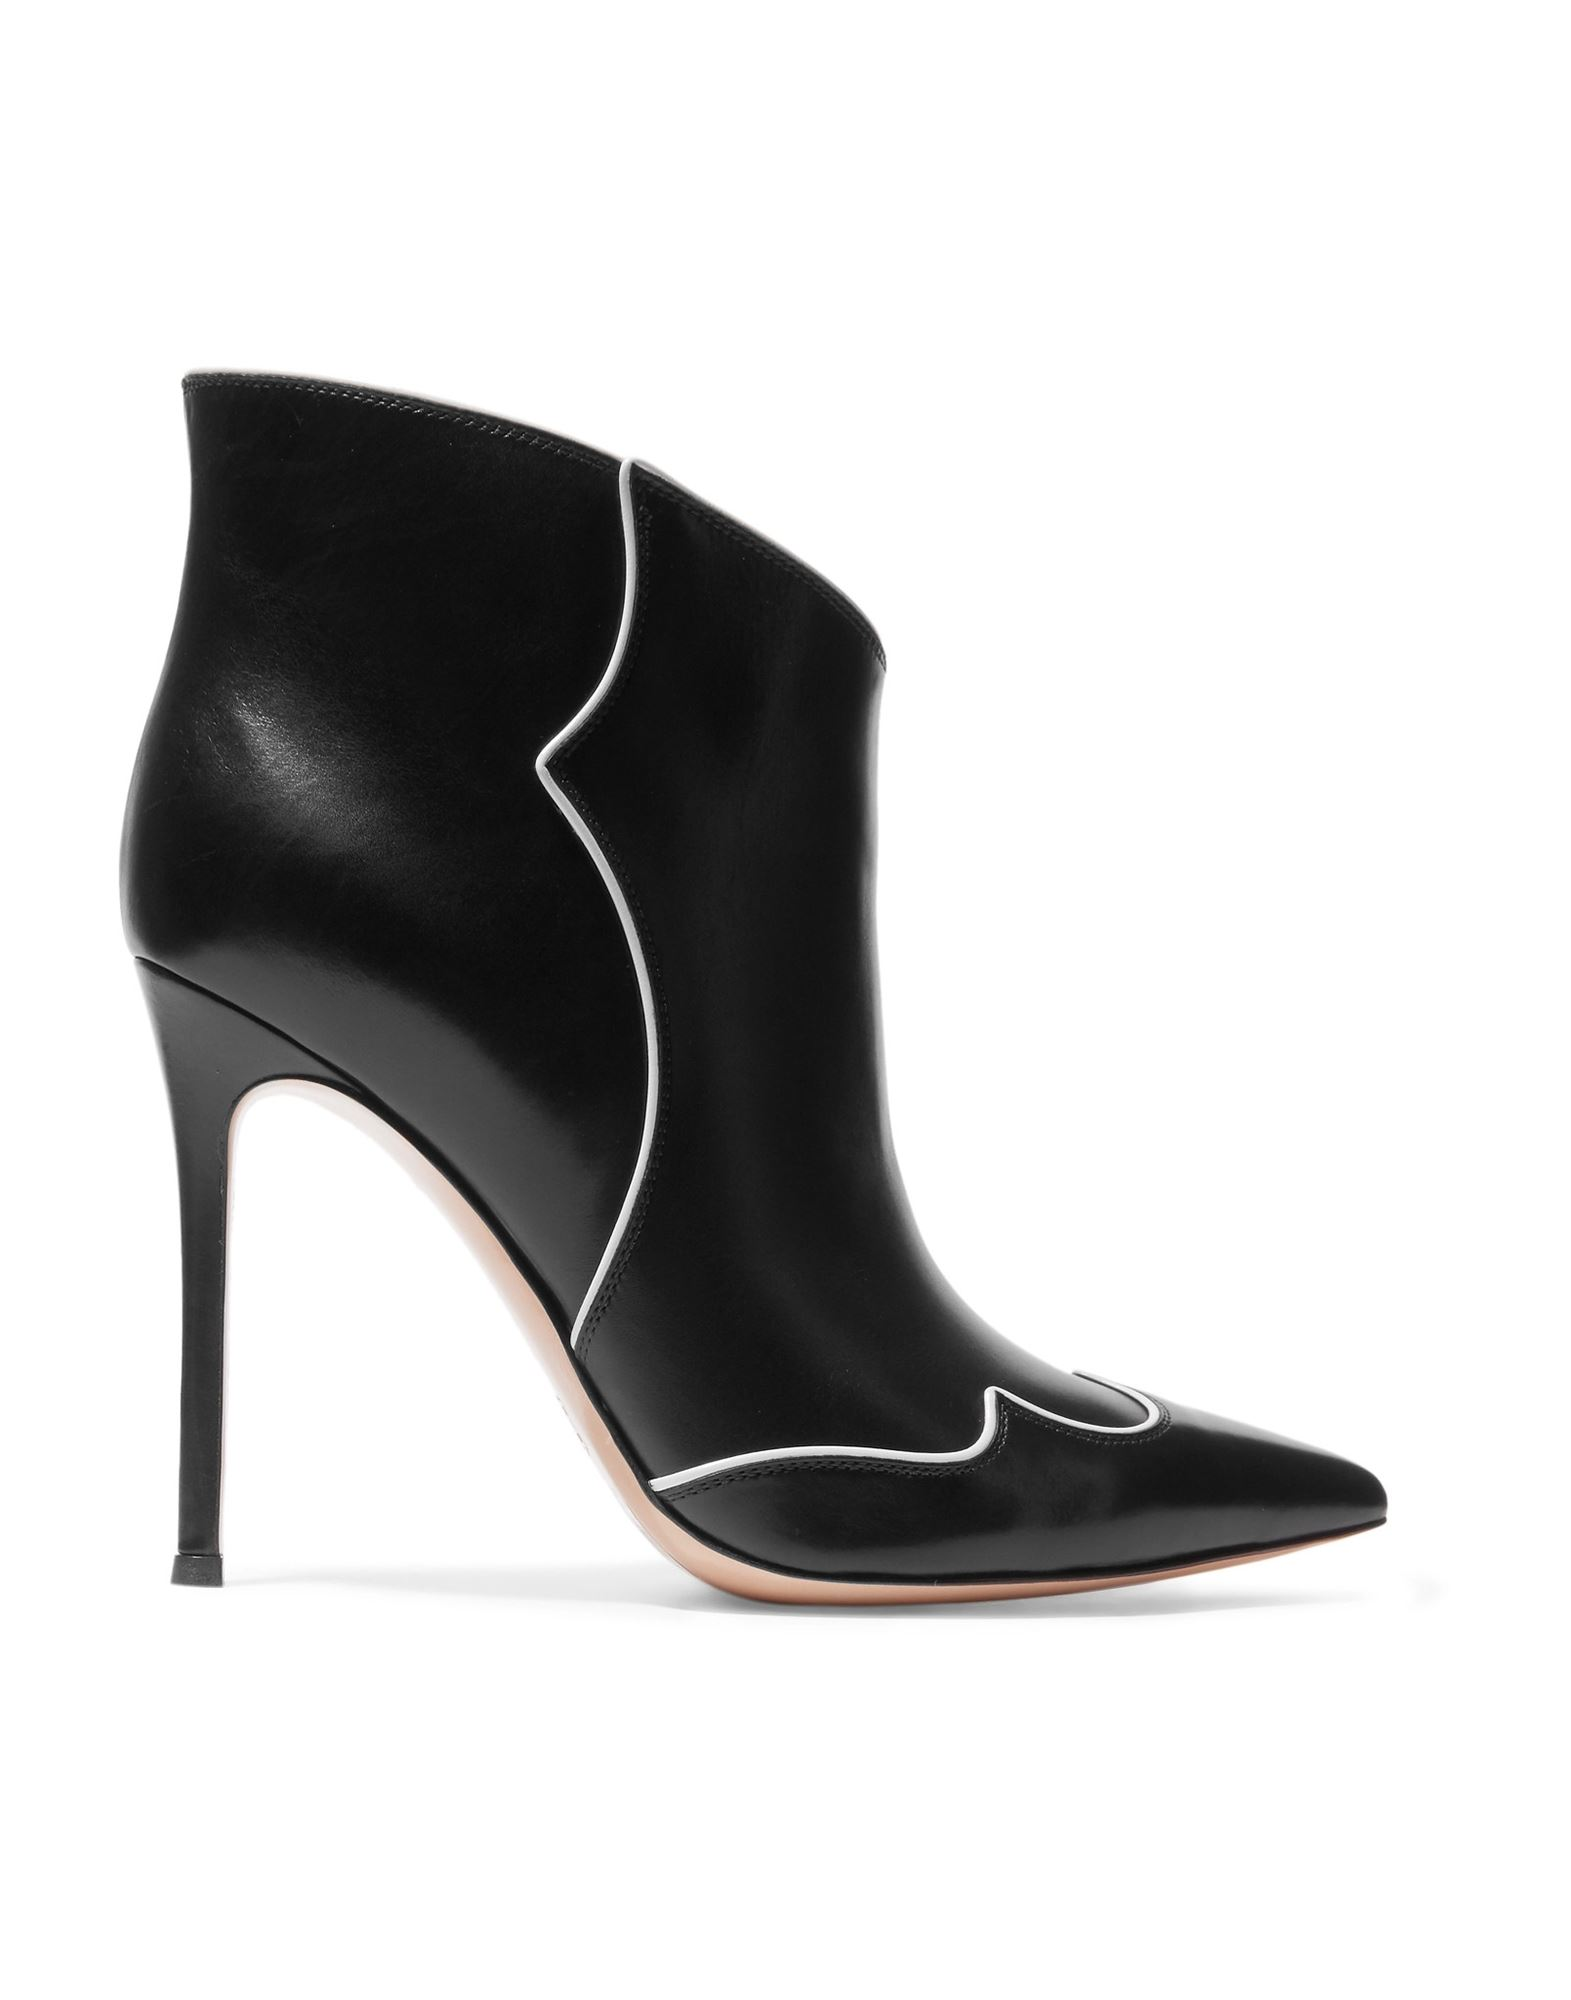 Фото - GIANVITO ROSSI Полусапоги и высокие ботинки opp france полусапоги и высокие ботинки